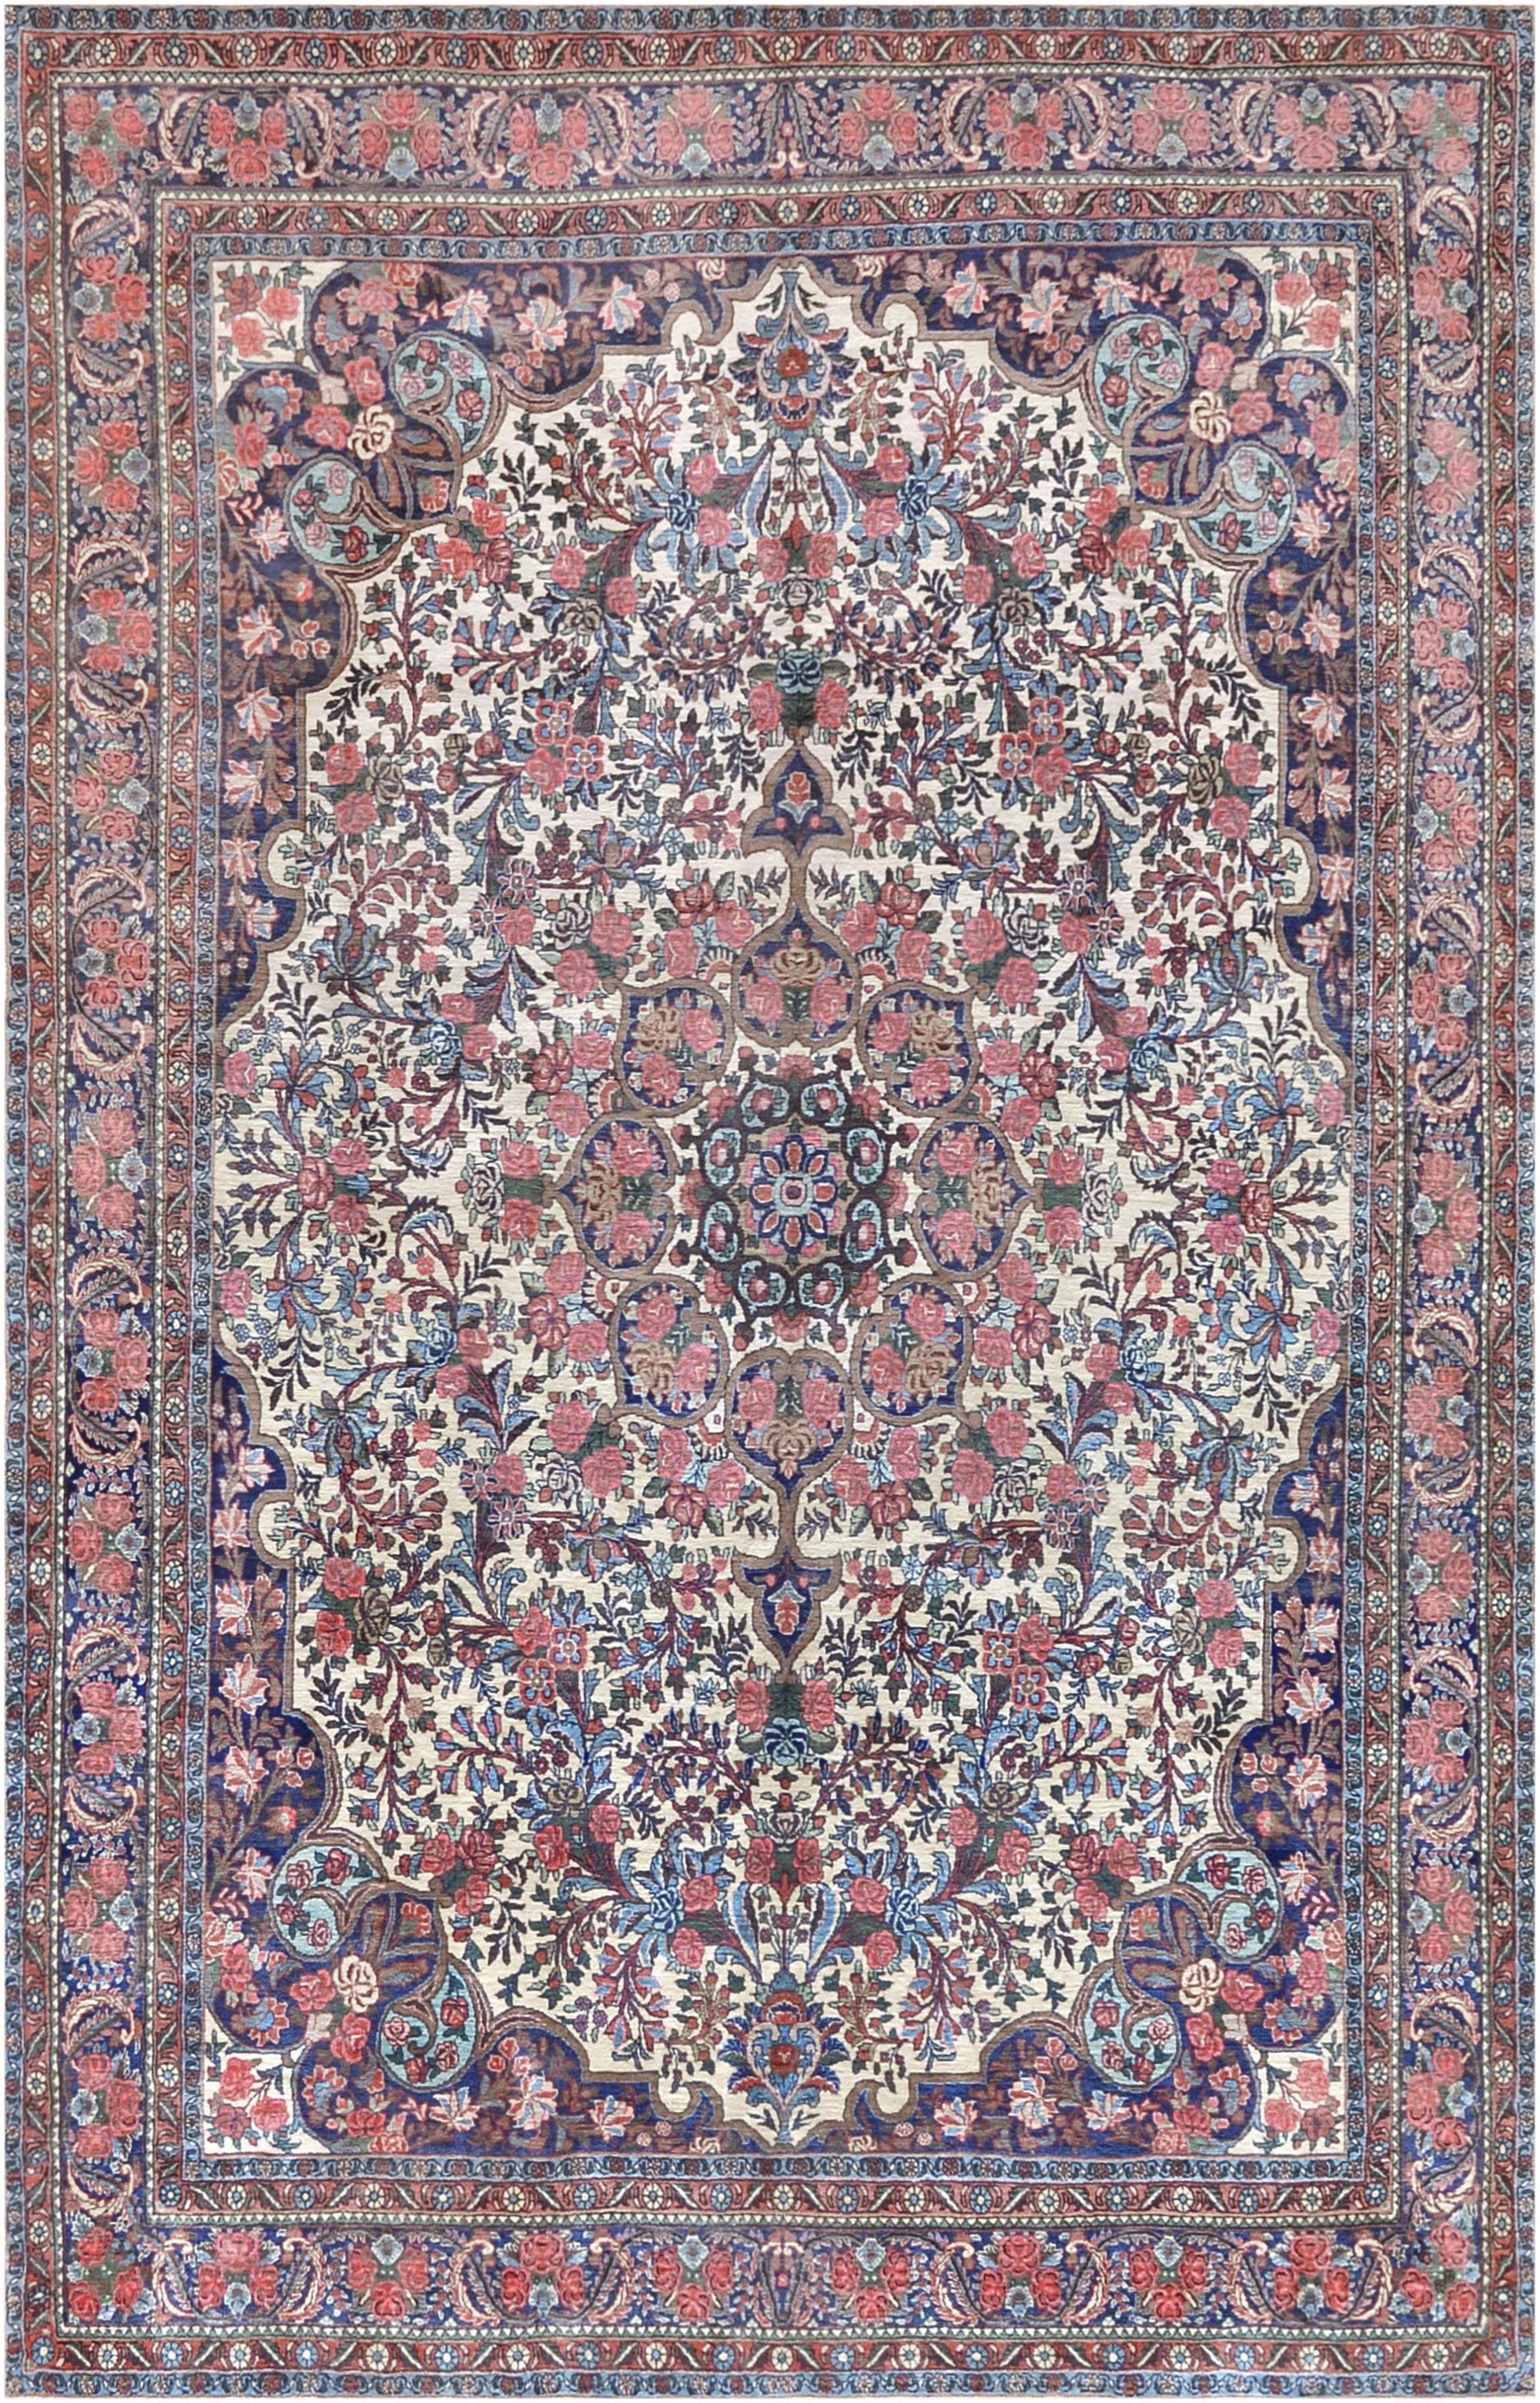 Mansour Original Handwoven Persian Bidjar In 2020 Rugs On Carpet Plush Carpet Iranian Carpet